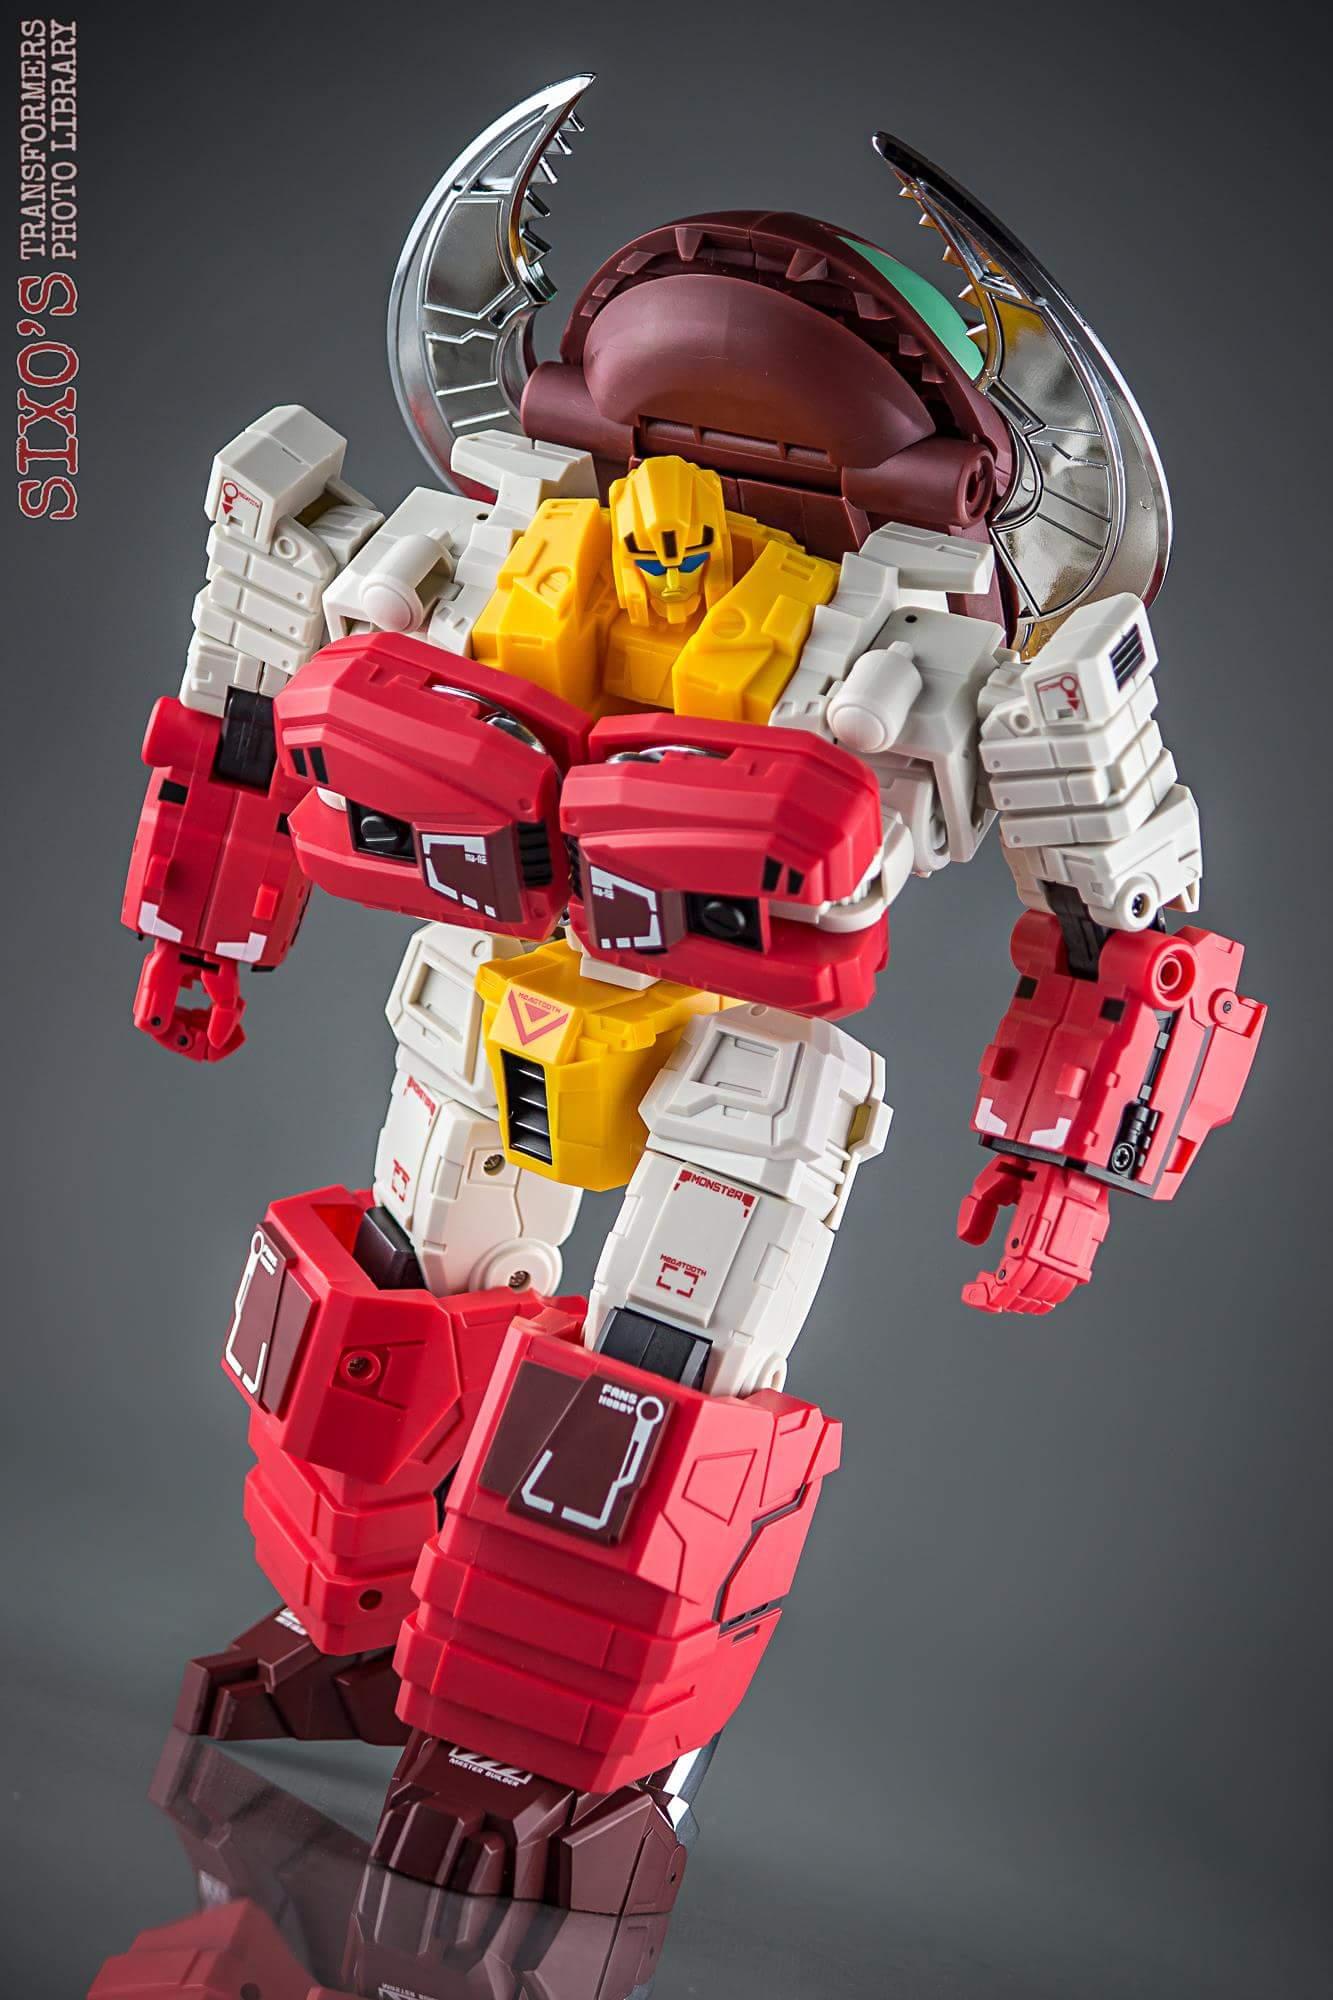 [FansHobby] Produit Tiers - Master Builder MB-02/03/05 - aka Monsterbots/Monstrebots - Page 2 ZusongaA